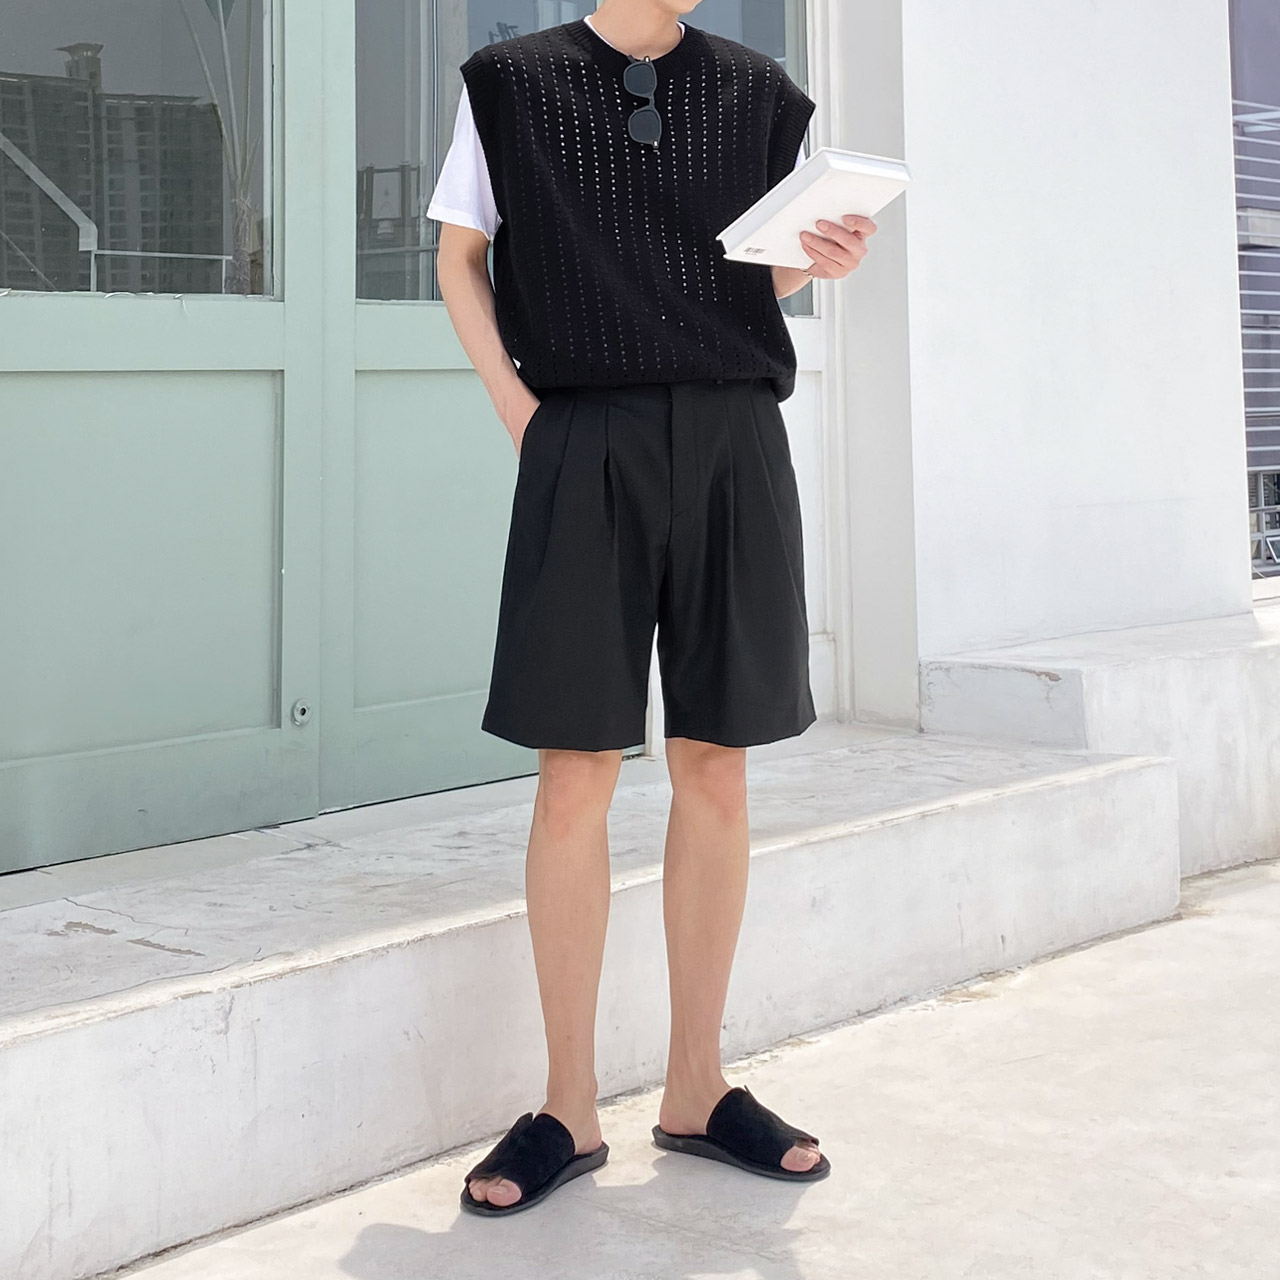 tomonari-토모나리(TOMONARI) [벤티즈 쓰리턱 하프 슬랙스 반바지]♡韓國男裝褲子